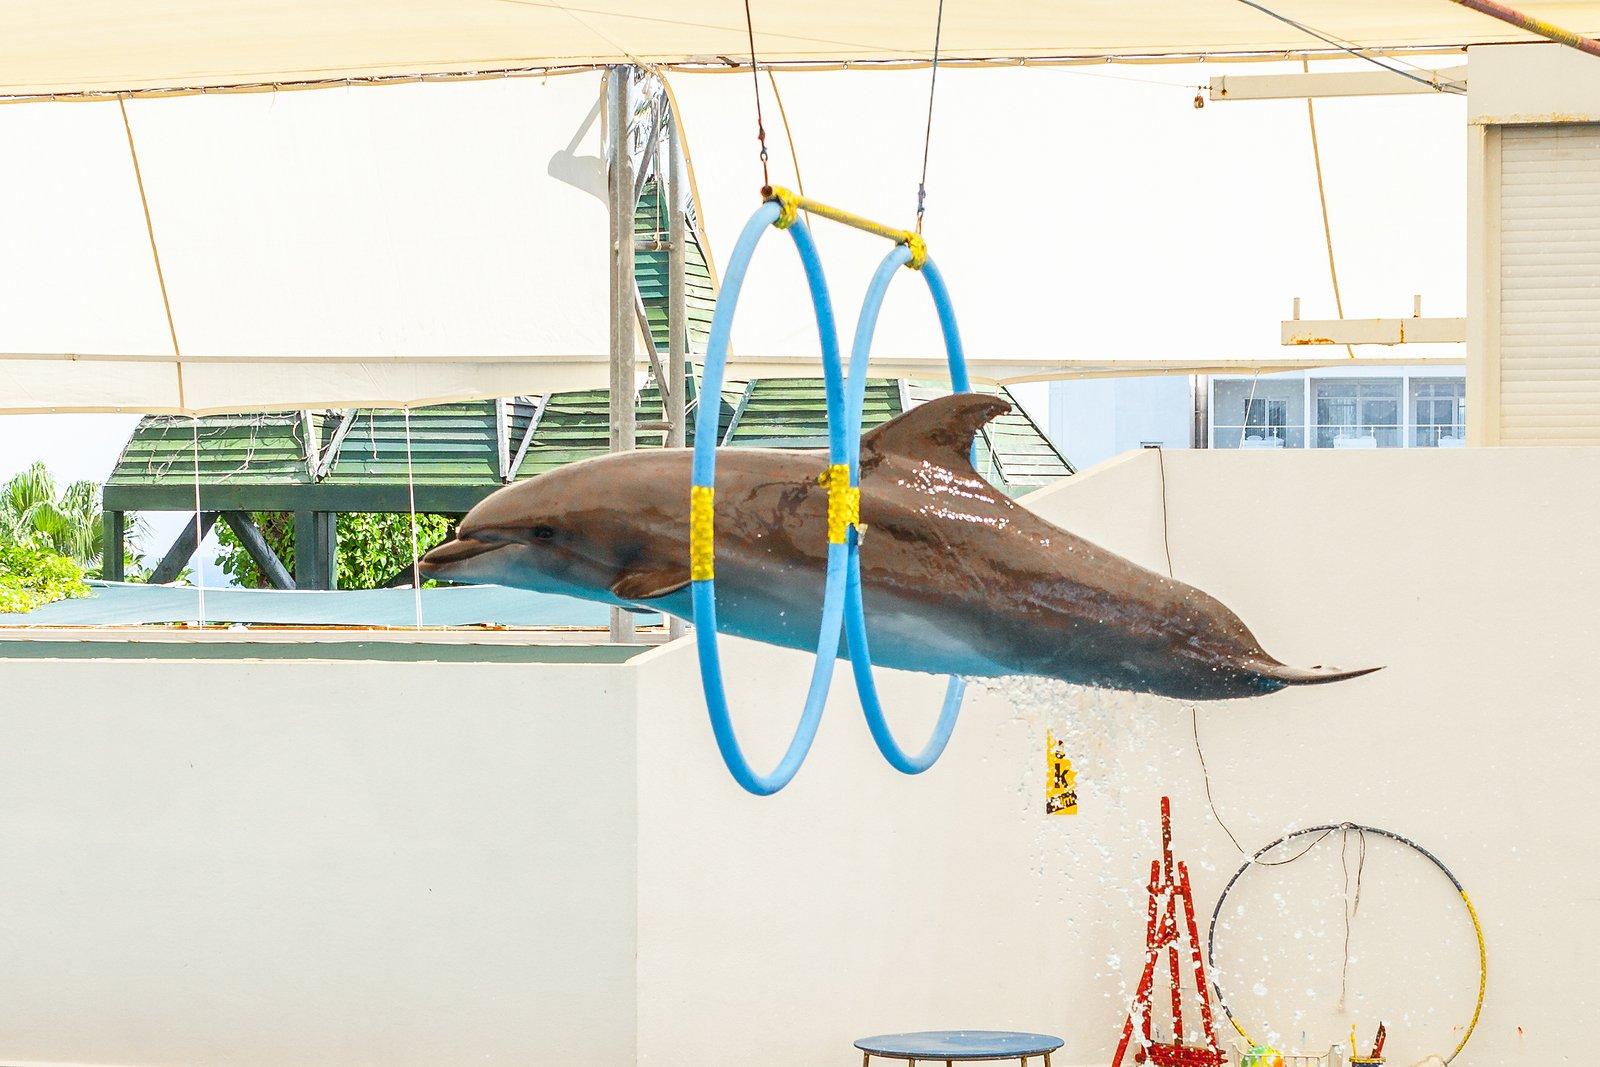 Dolphin jumping through hoop